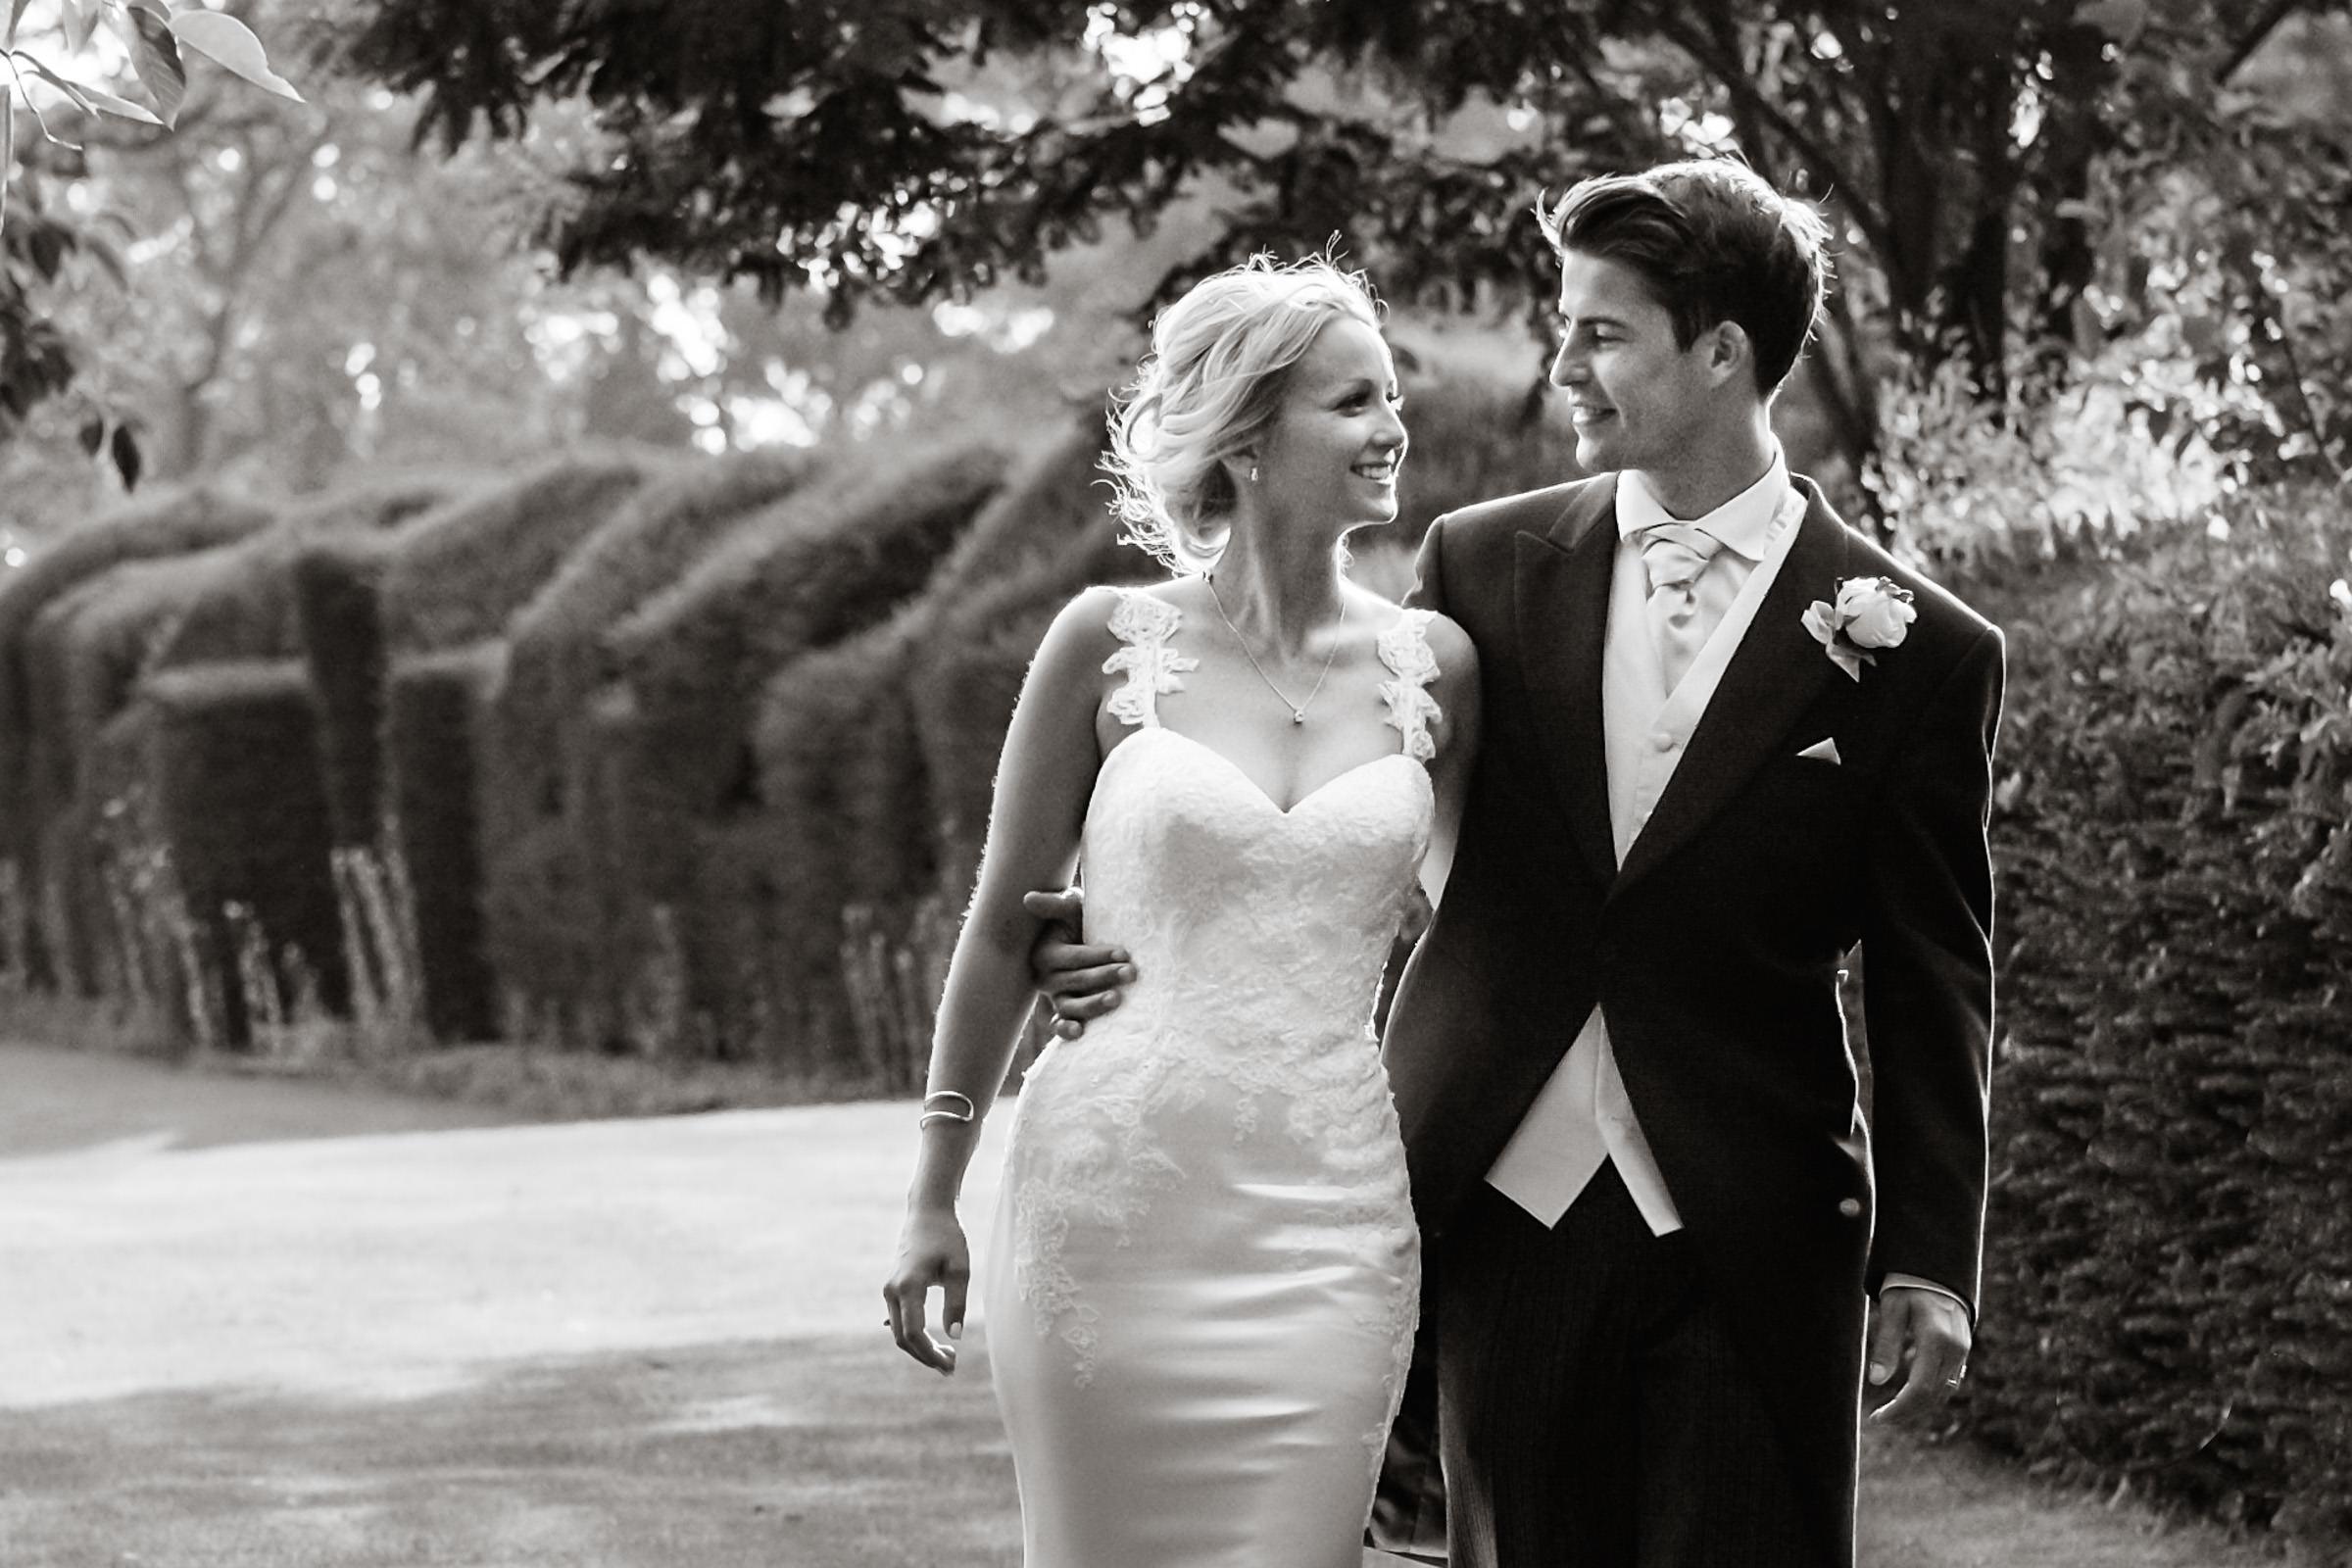 Wedding at Parkside School in Surrey 027.jpg